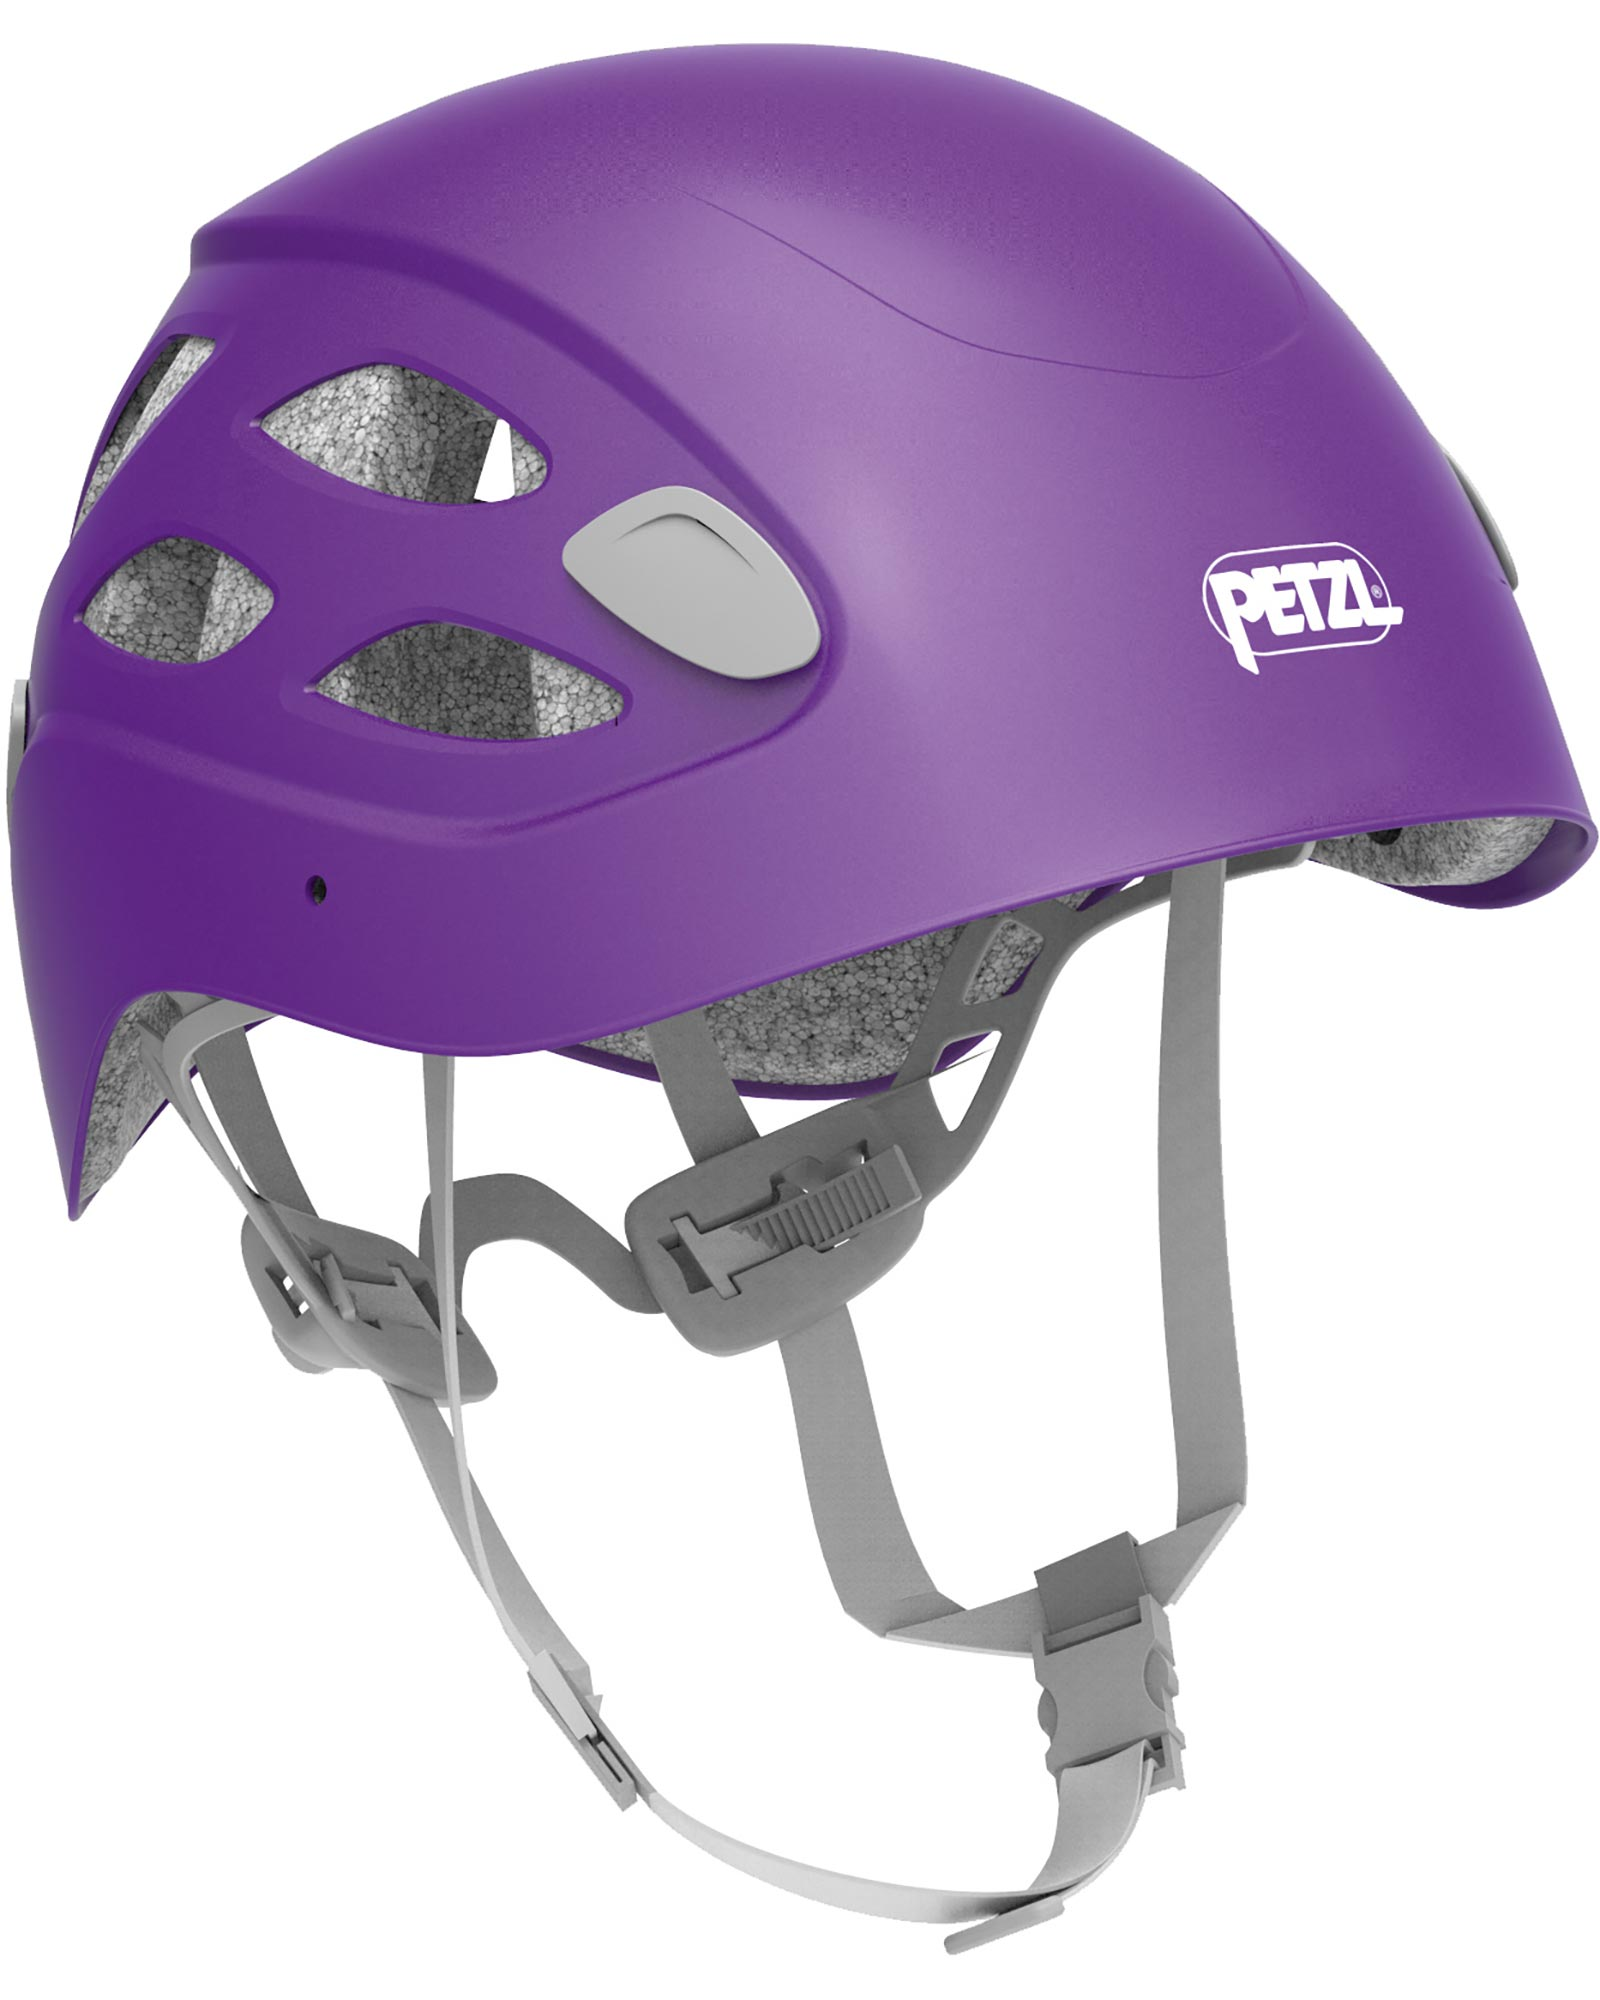 Petzl Women's Borea Climbing Helmet 0